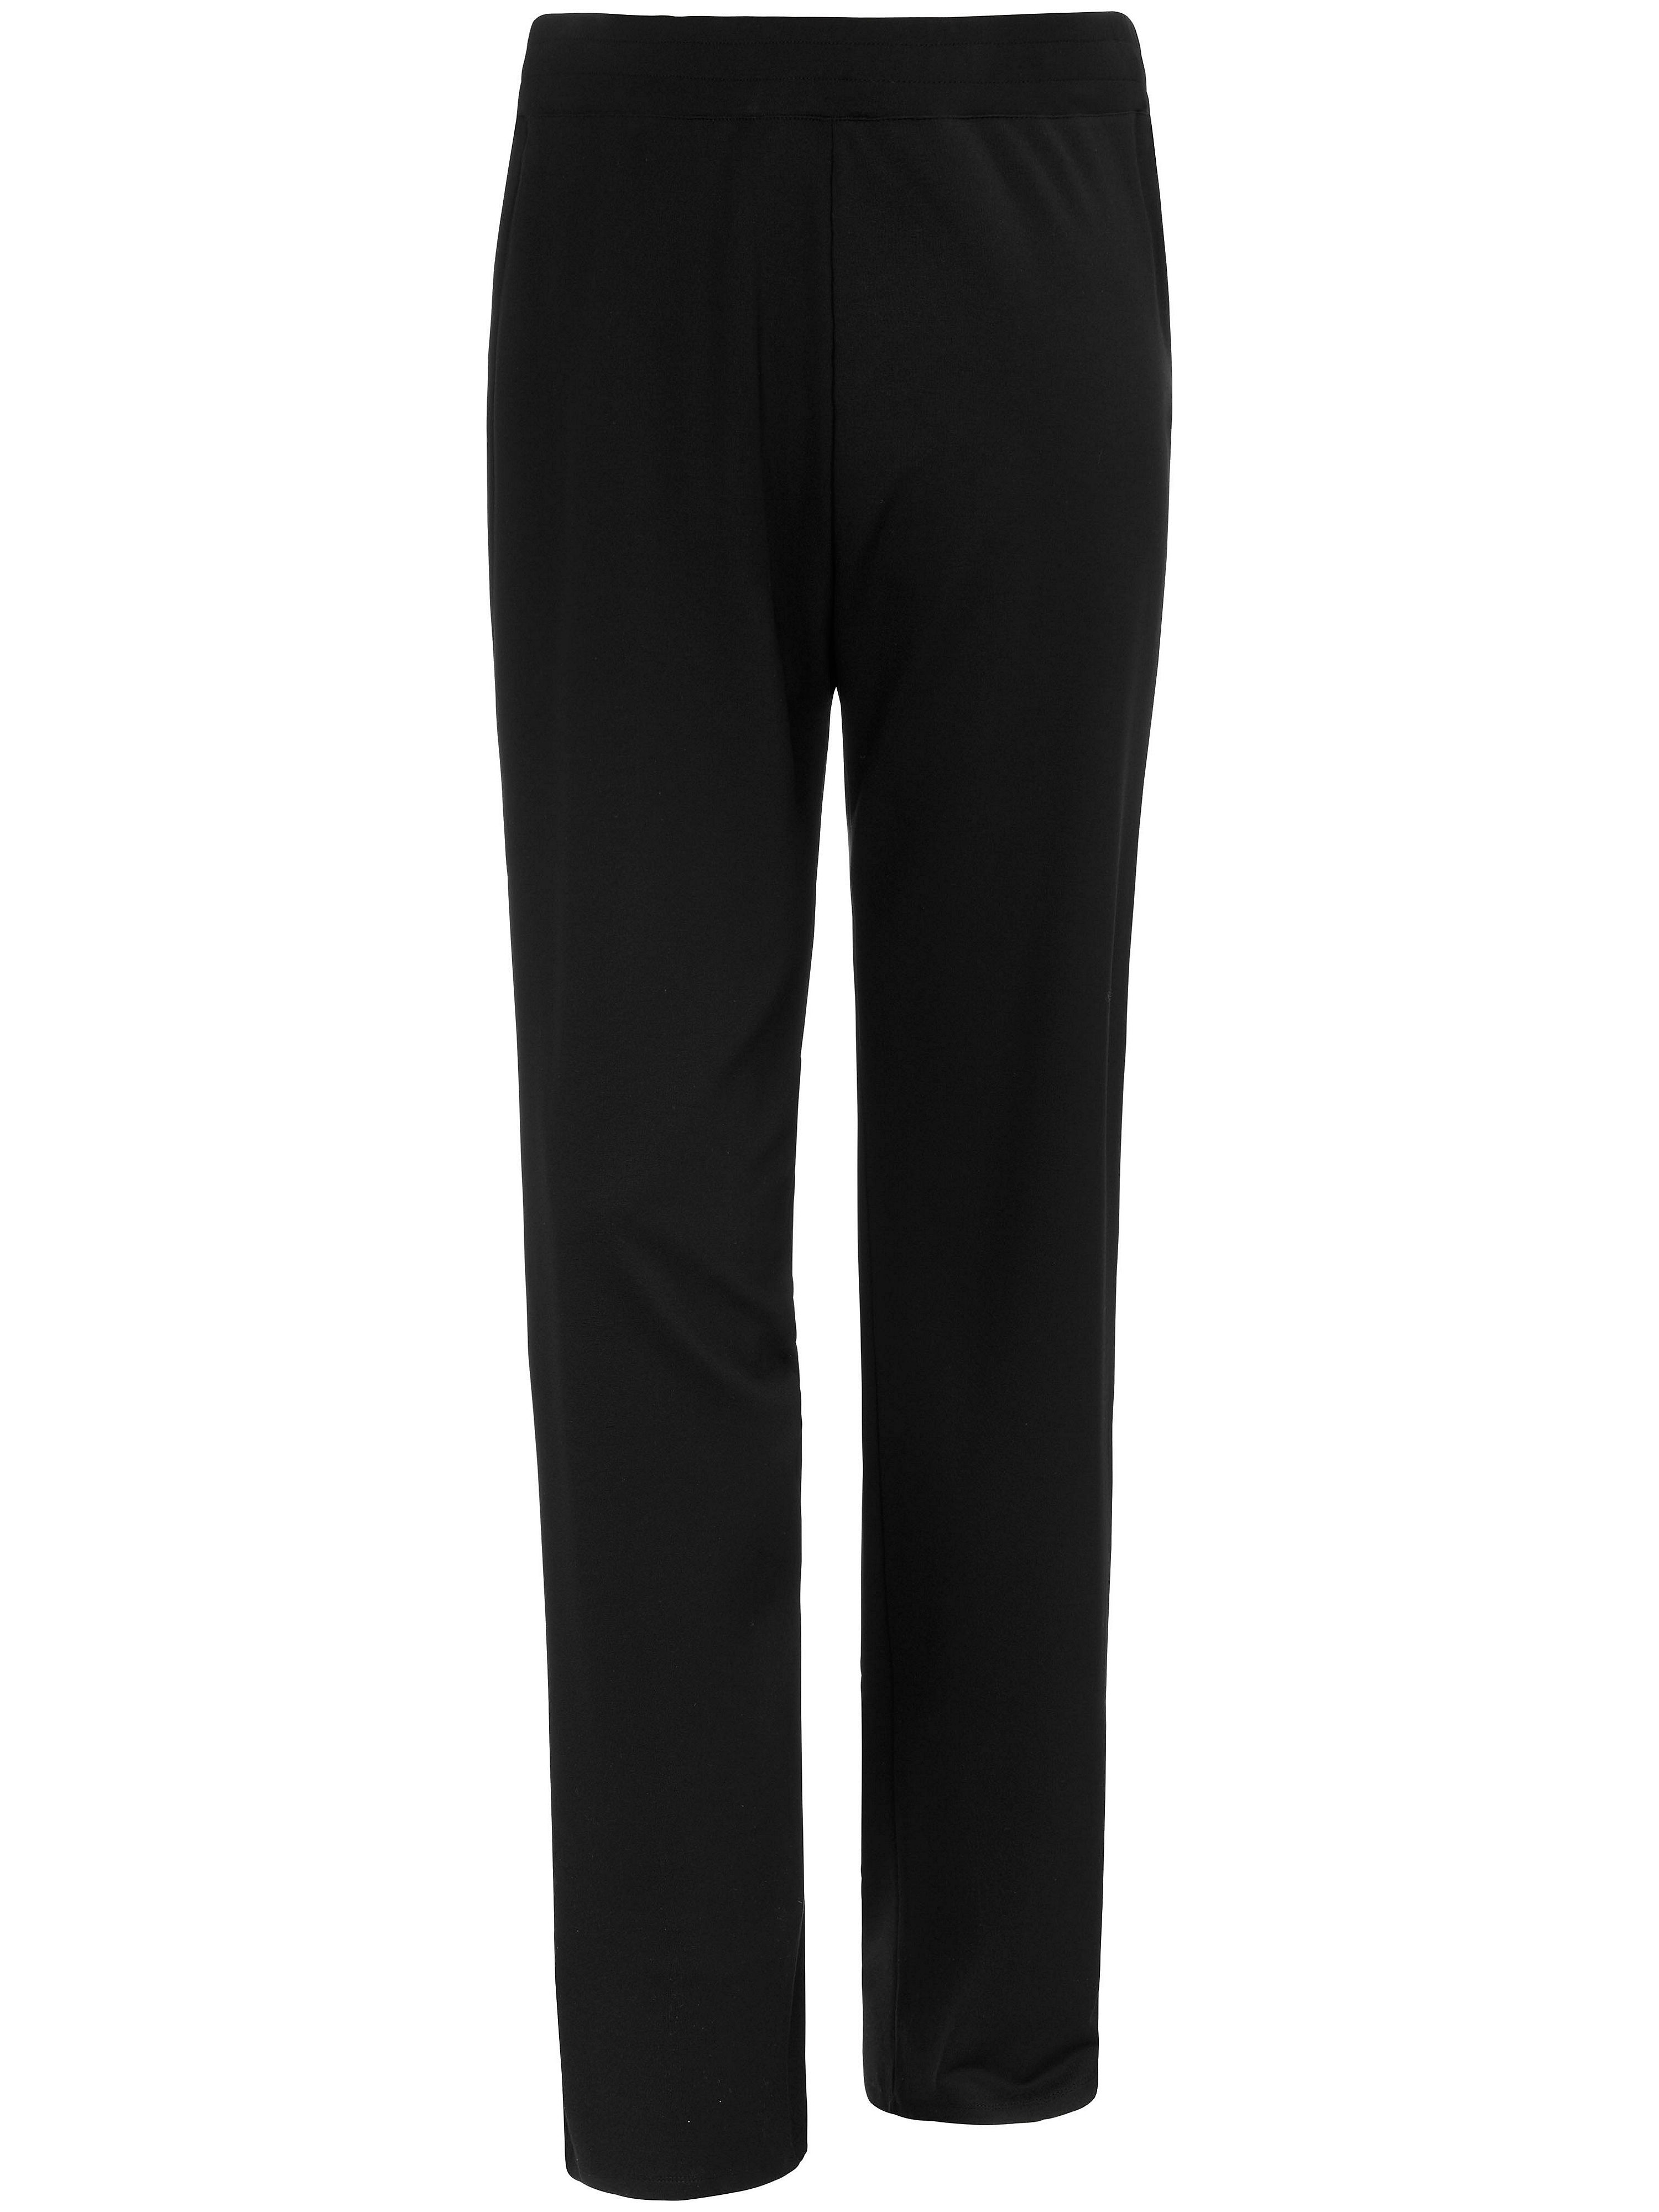 Le pantalon en jersey  Anna Aura noir